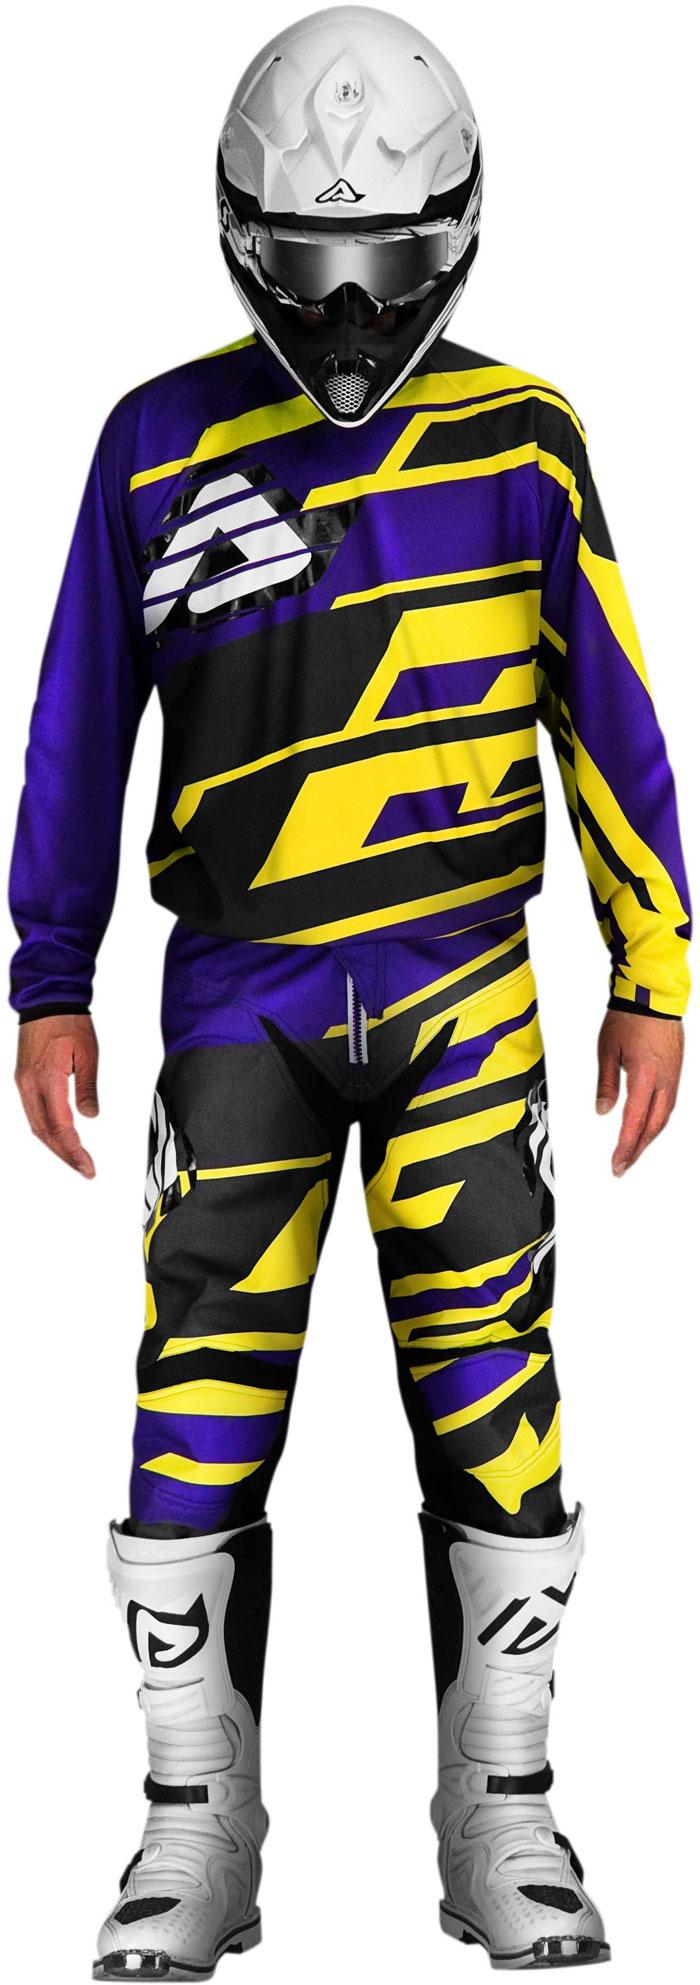 Pants cross Acerbis Profile Purple Yellow